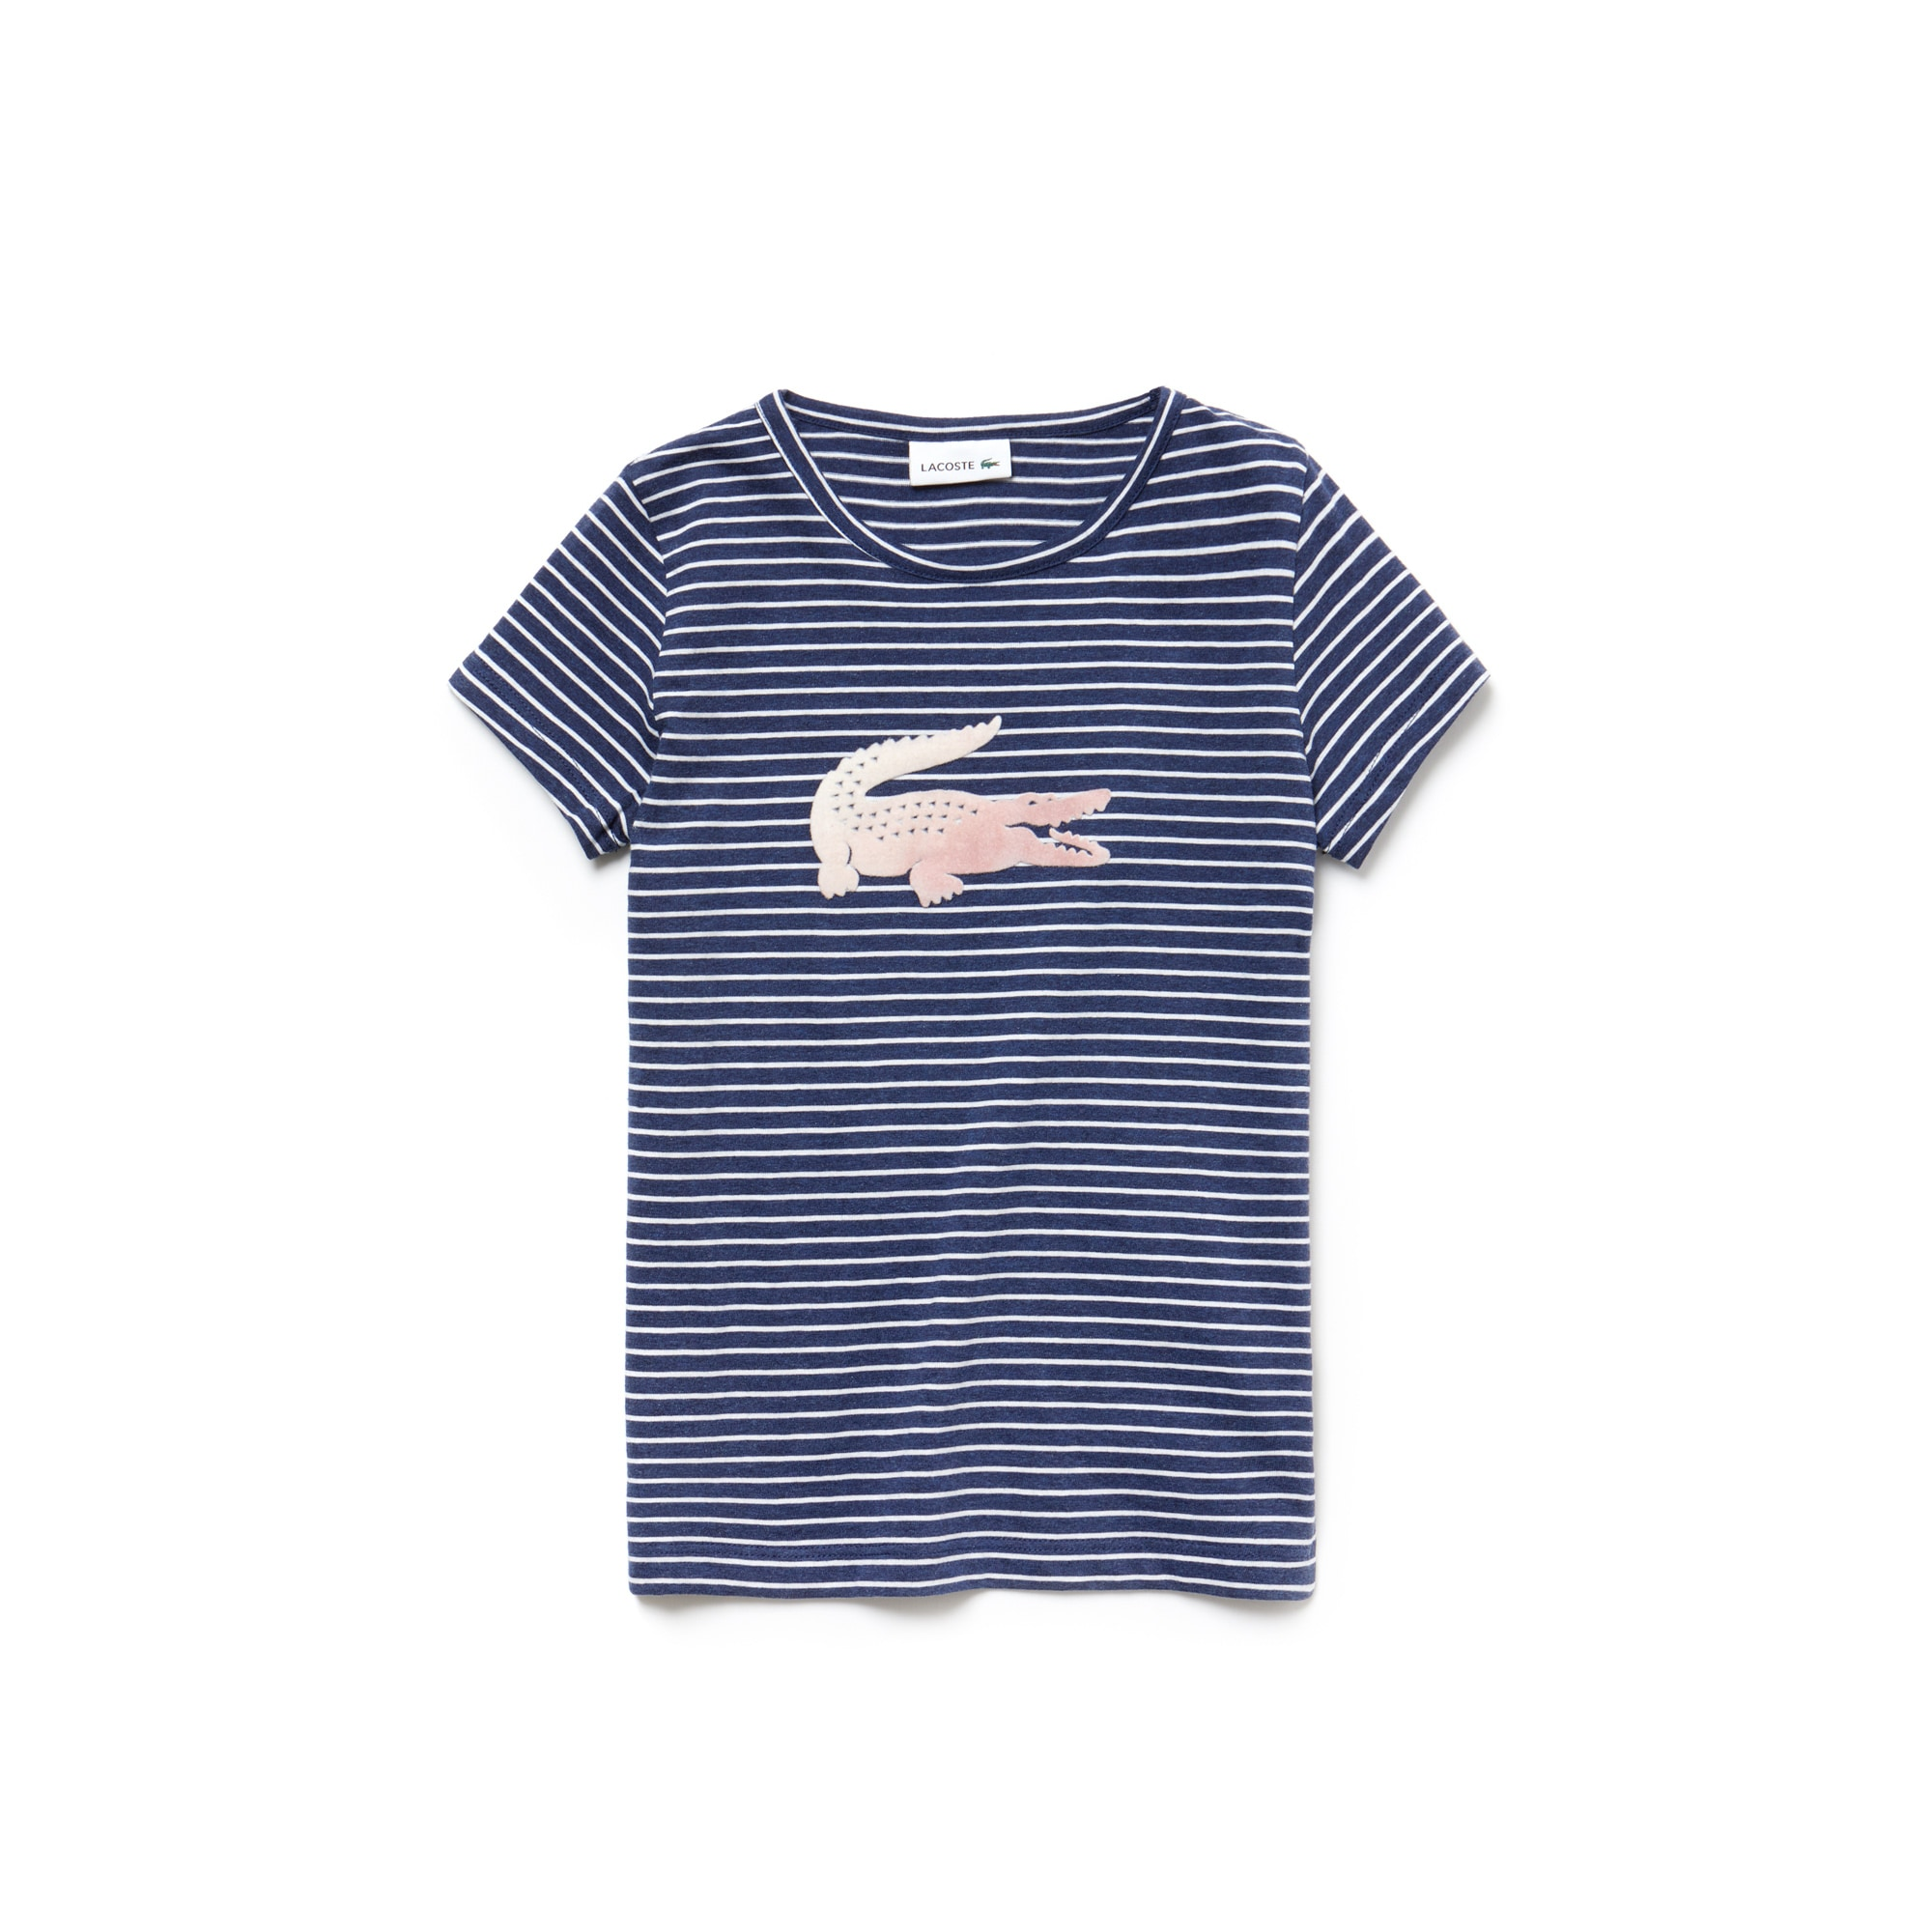 825beb51706 Camiseta infantil listrada de gola redonda com crocodilo Oversized em jérsei